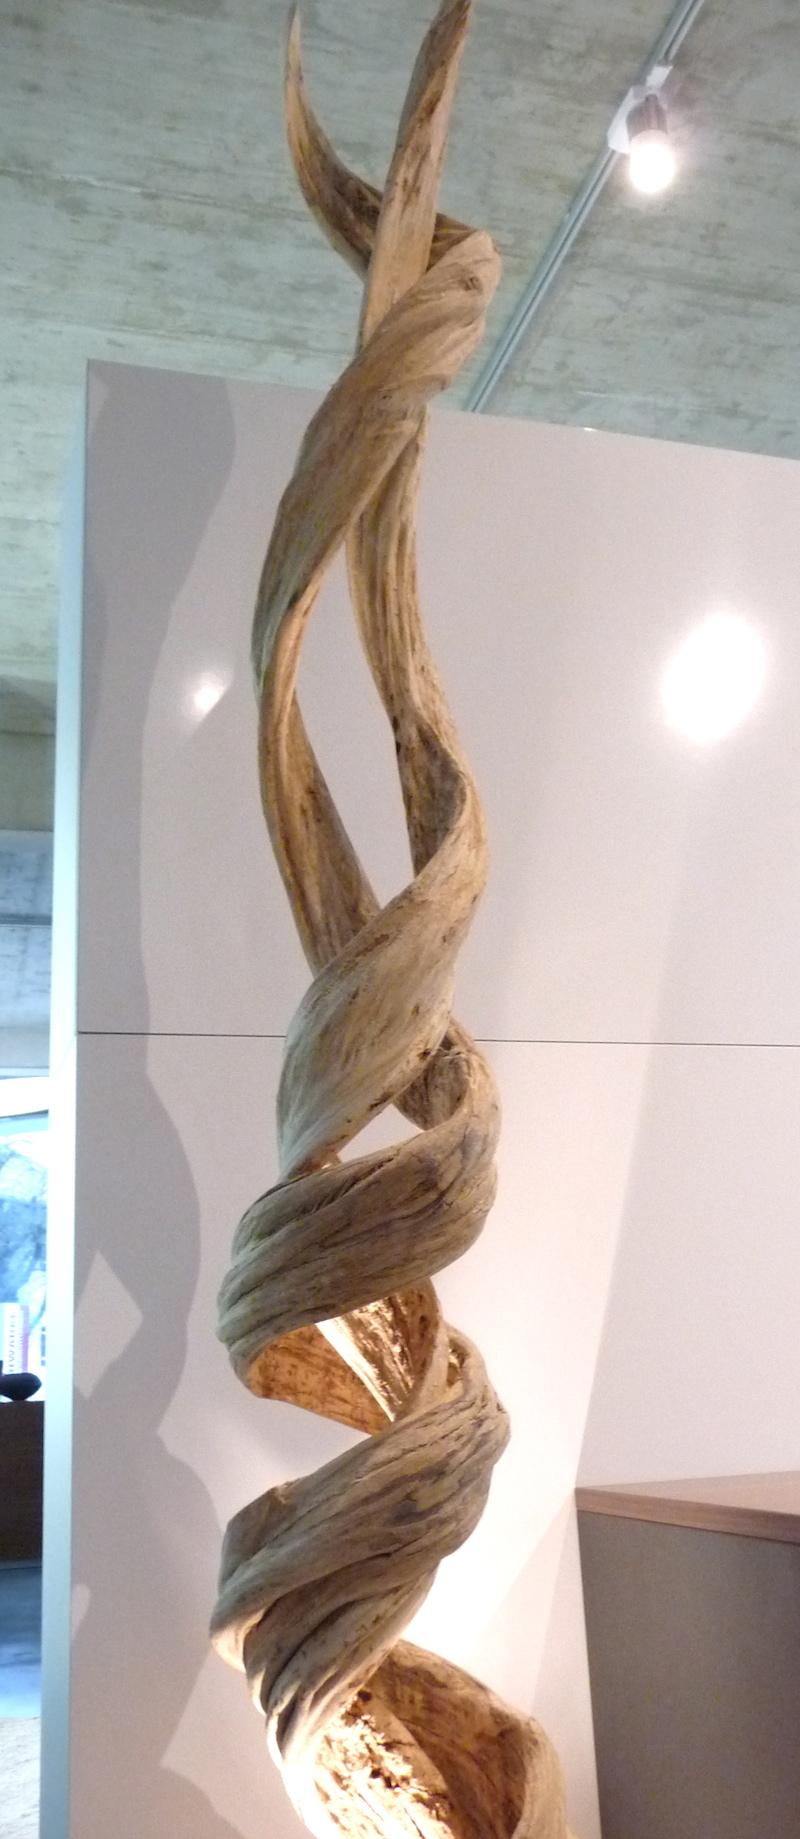 Lampe stehlampe holz gigant 230 cm schwemmholz treibholz wurzelholz teak - Lampe liane bouroullec ...